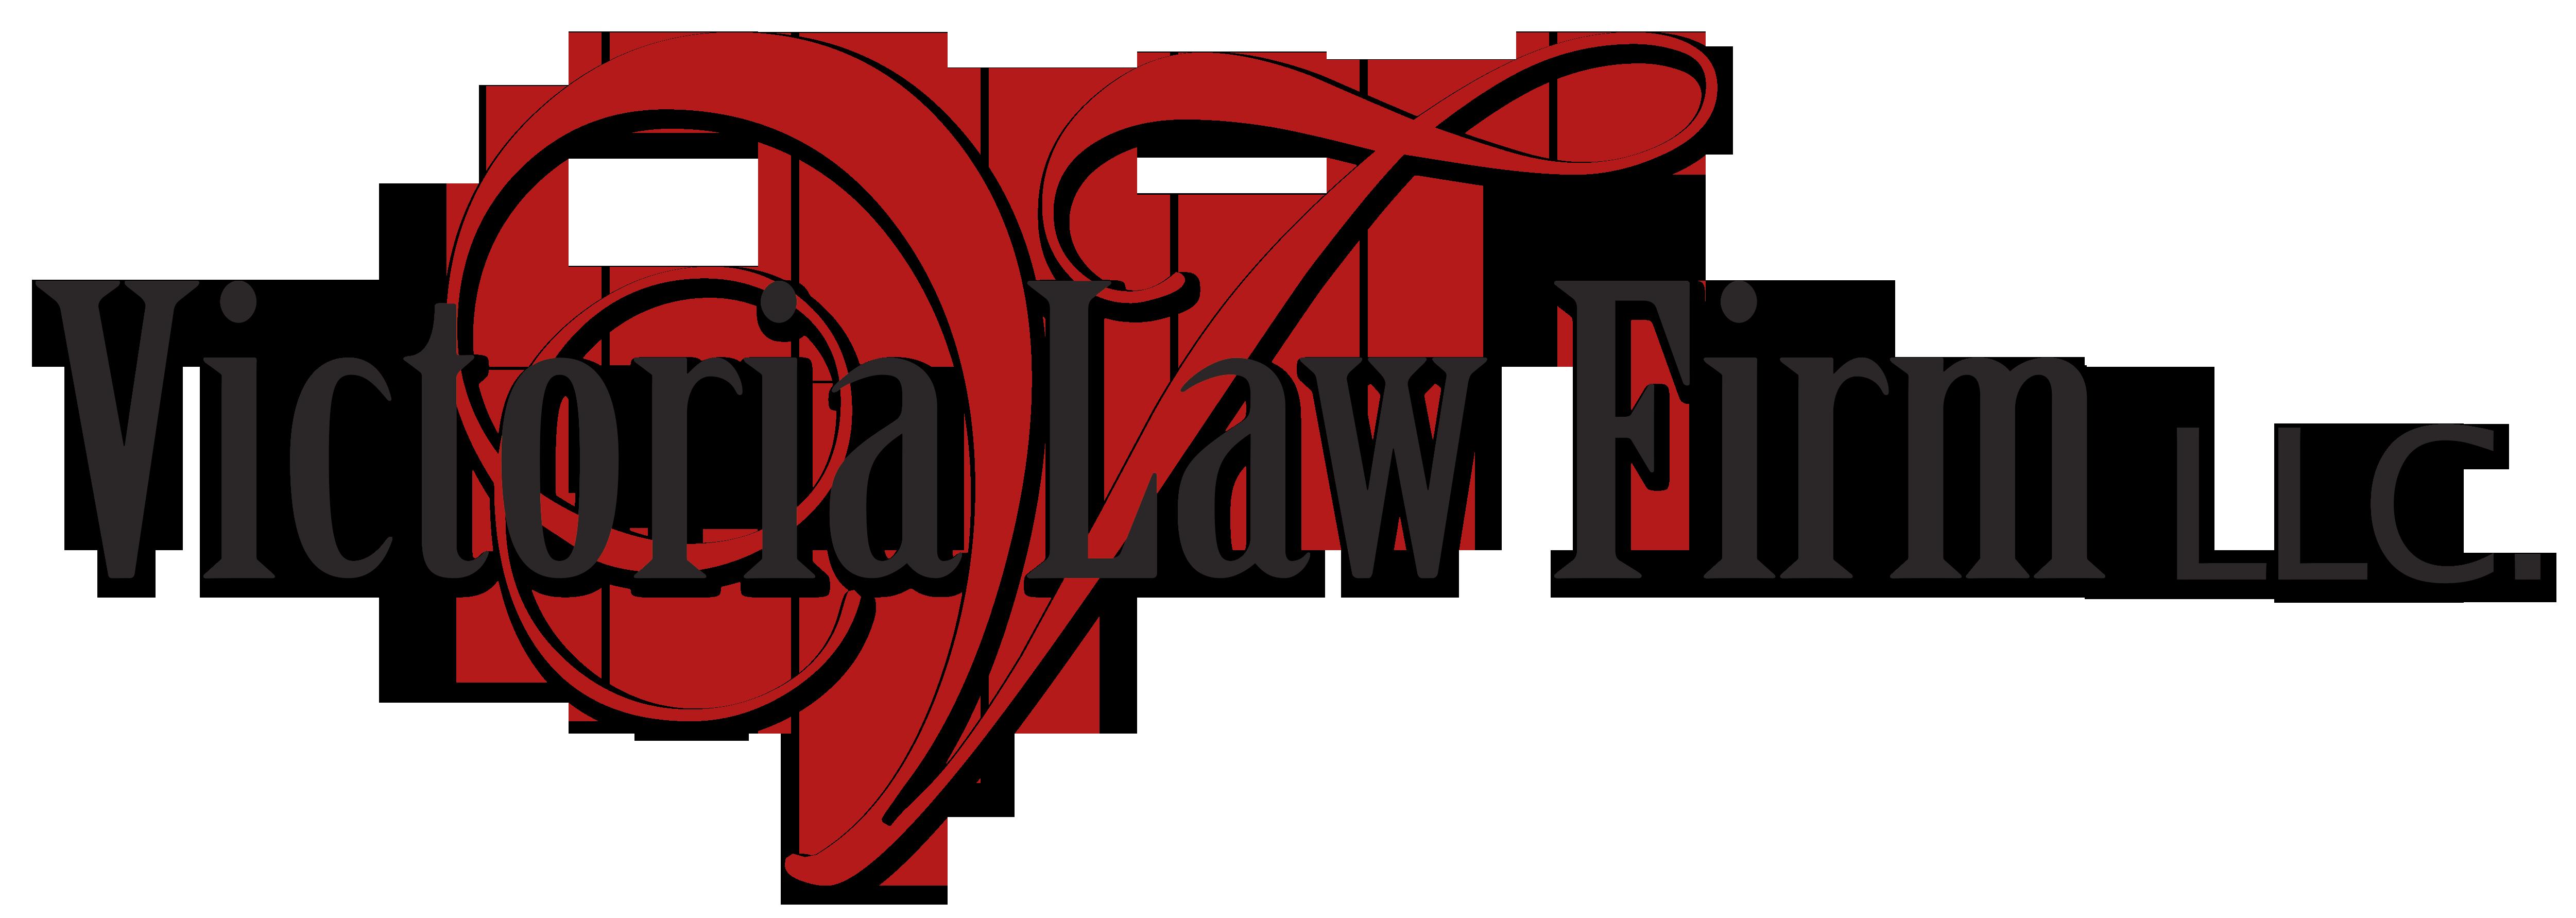 South Carolina DUS Defense Attorney - DUS defense lawyer